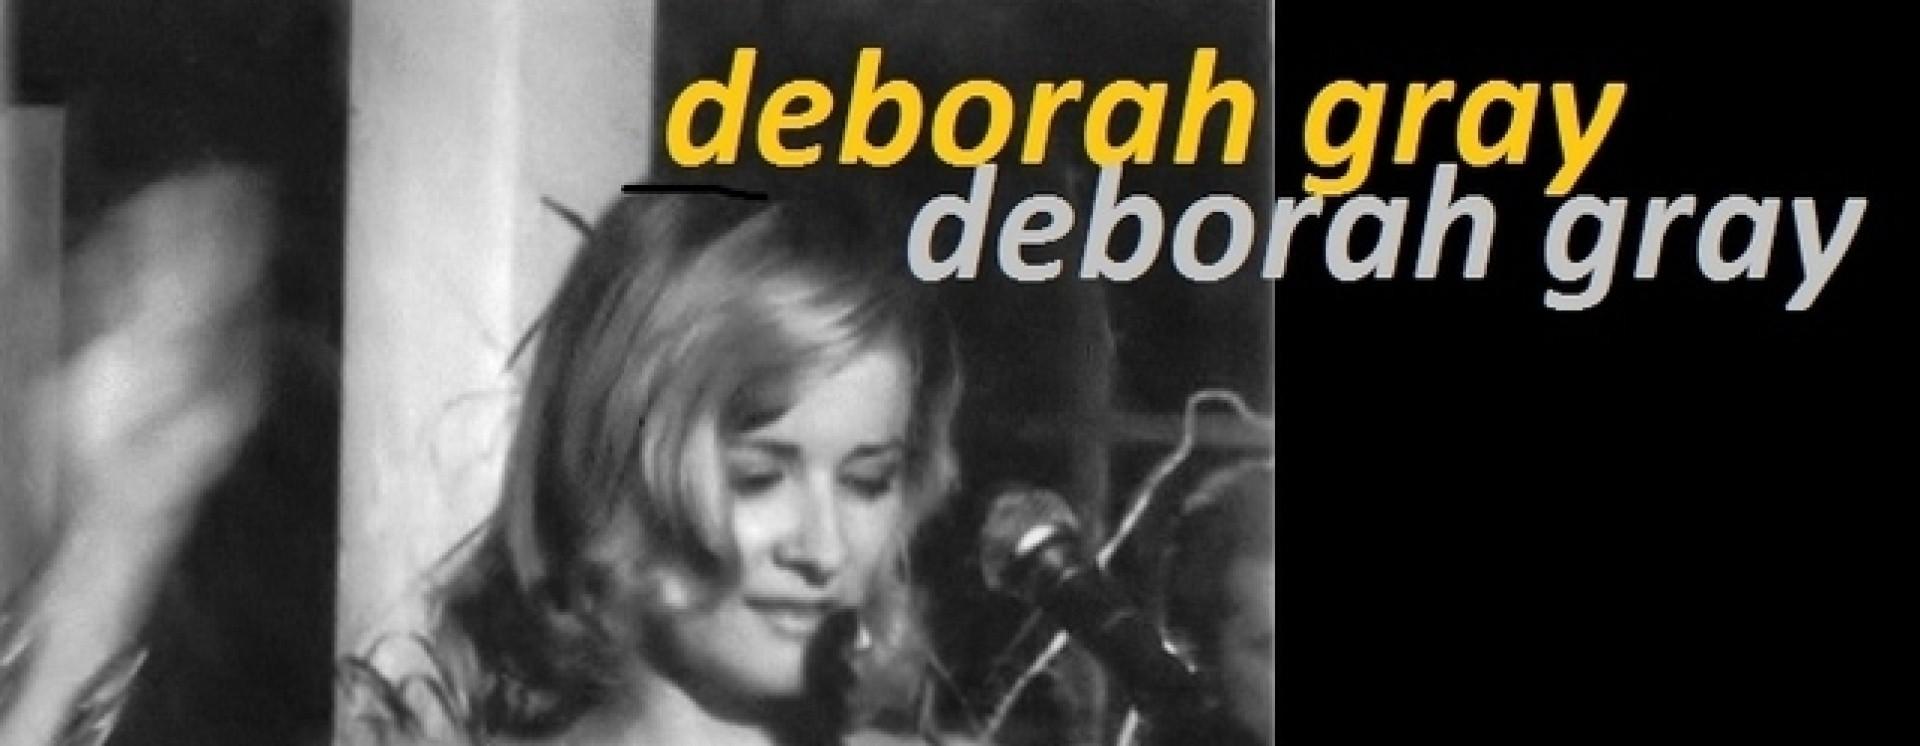 Terri Irwin,Marjorie Browne Erotic clip Danielle Lloyd,Jo Rowbottom